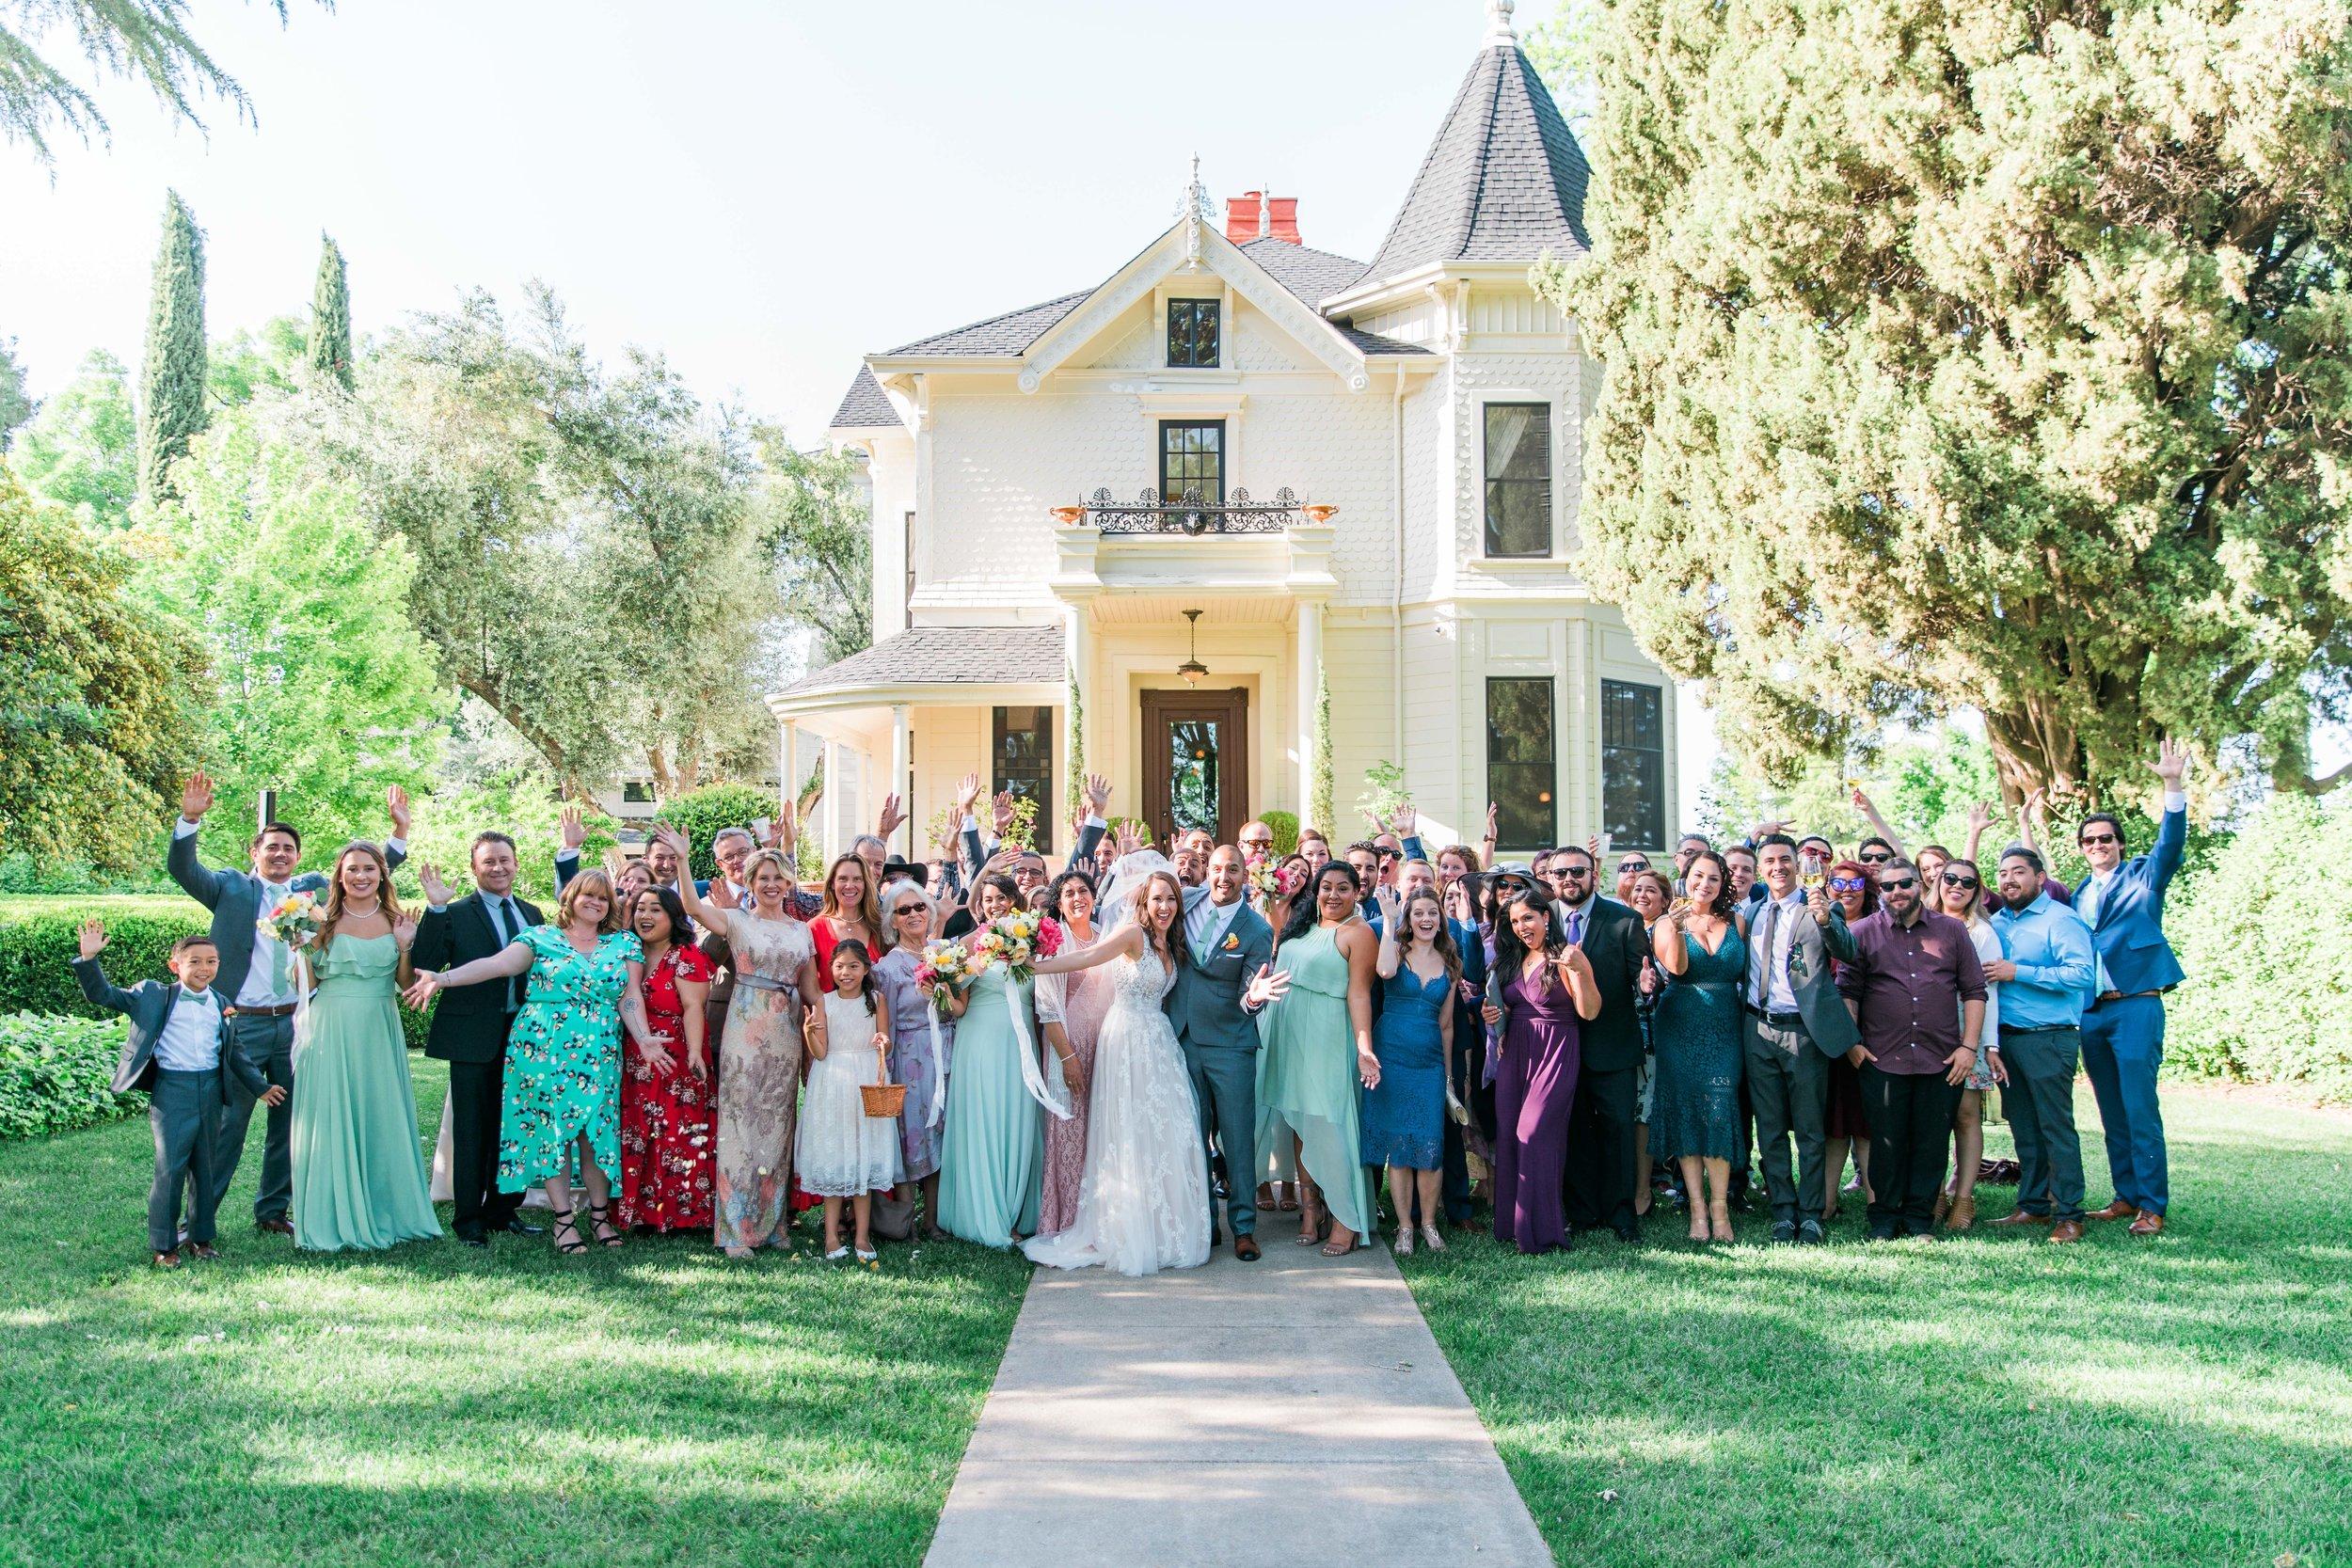 Tess-Jesse-Wedding-SP-by-JBJ-Pictures-13.jpg